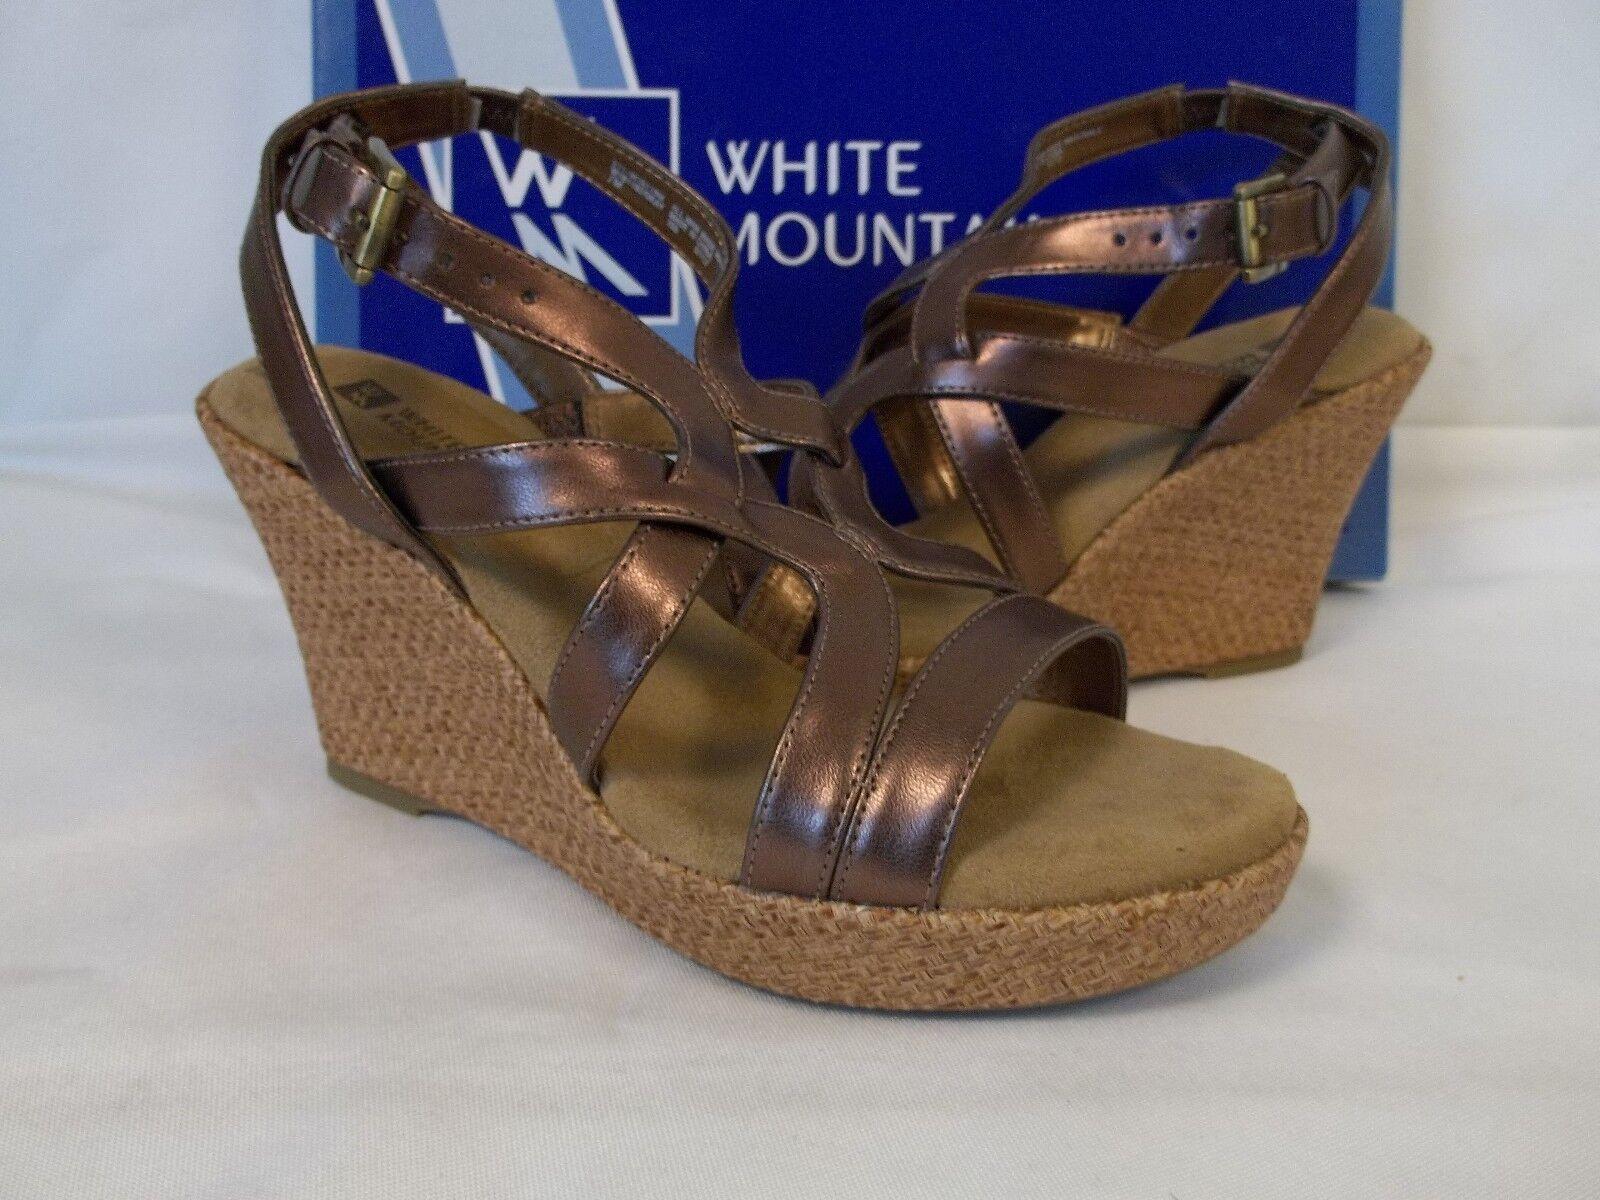 WEISS Mountain 7 M Okay Chocolate Open Toe Wedges NEU Damenschuhe Schuhes